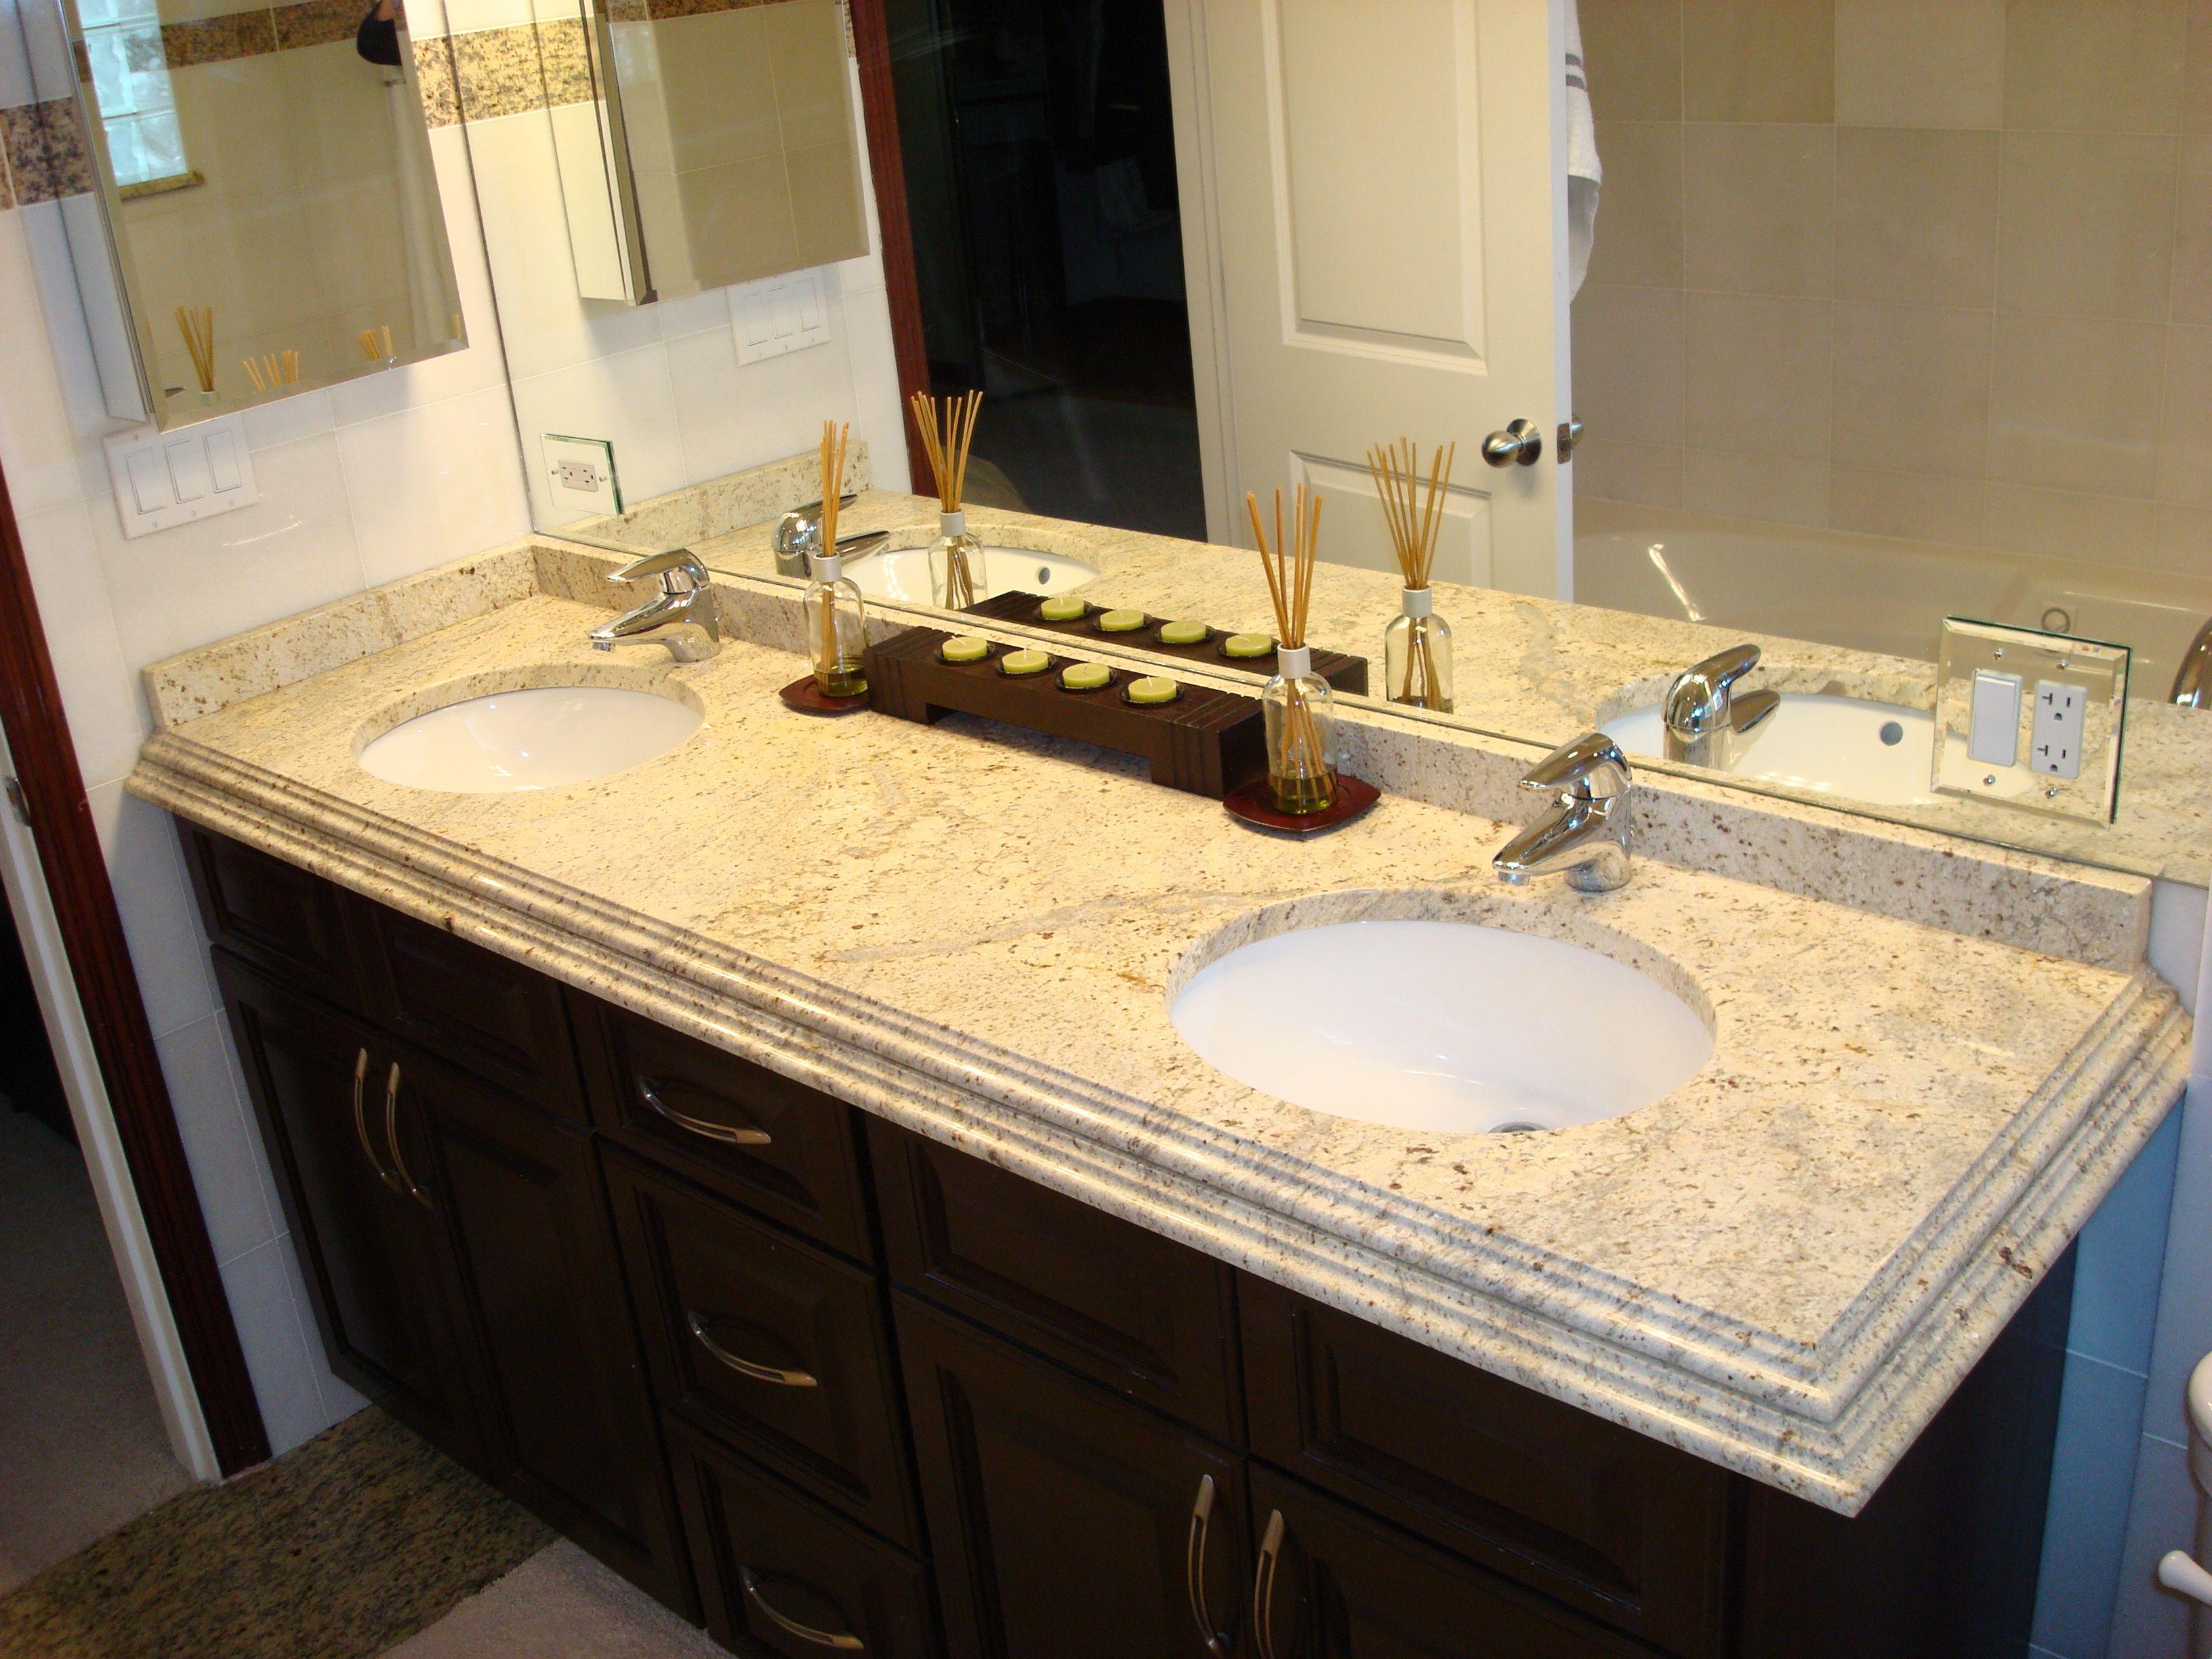 Marble Bathroom Countertop White Bathroom Countertops Granite Bathroom Granite Bathroom Countertops